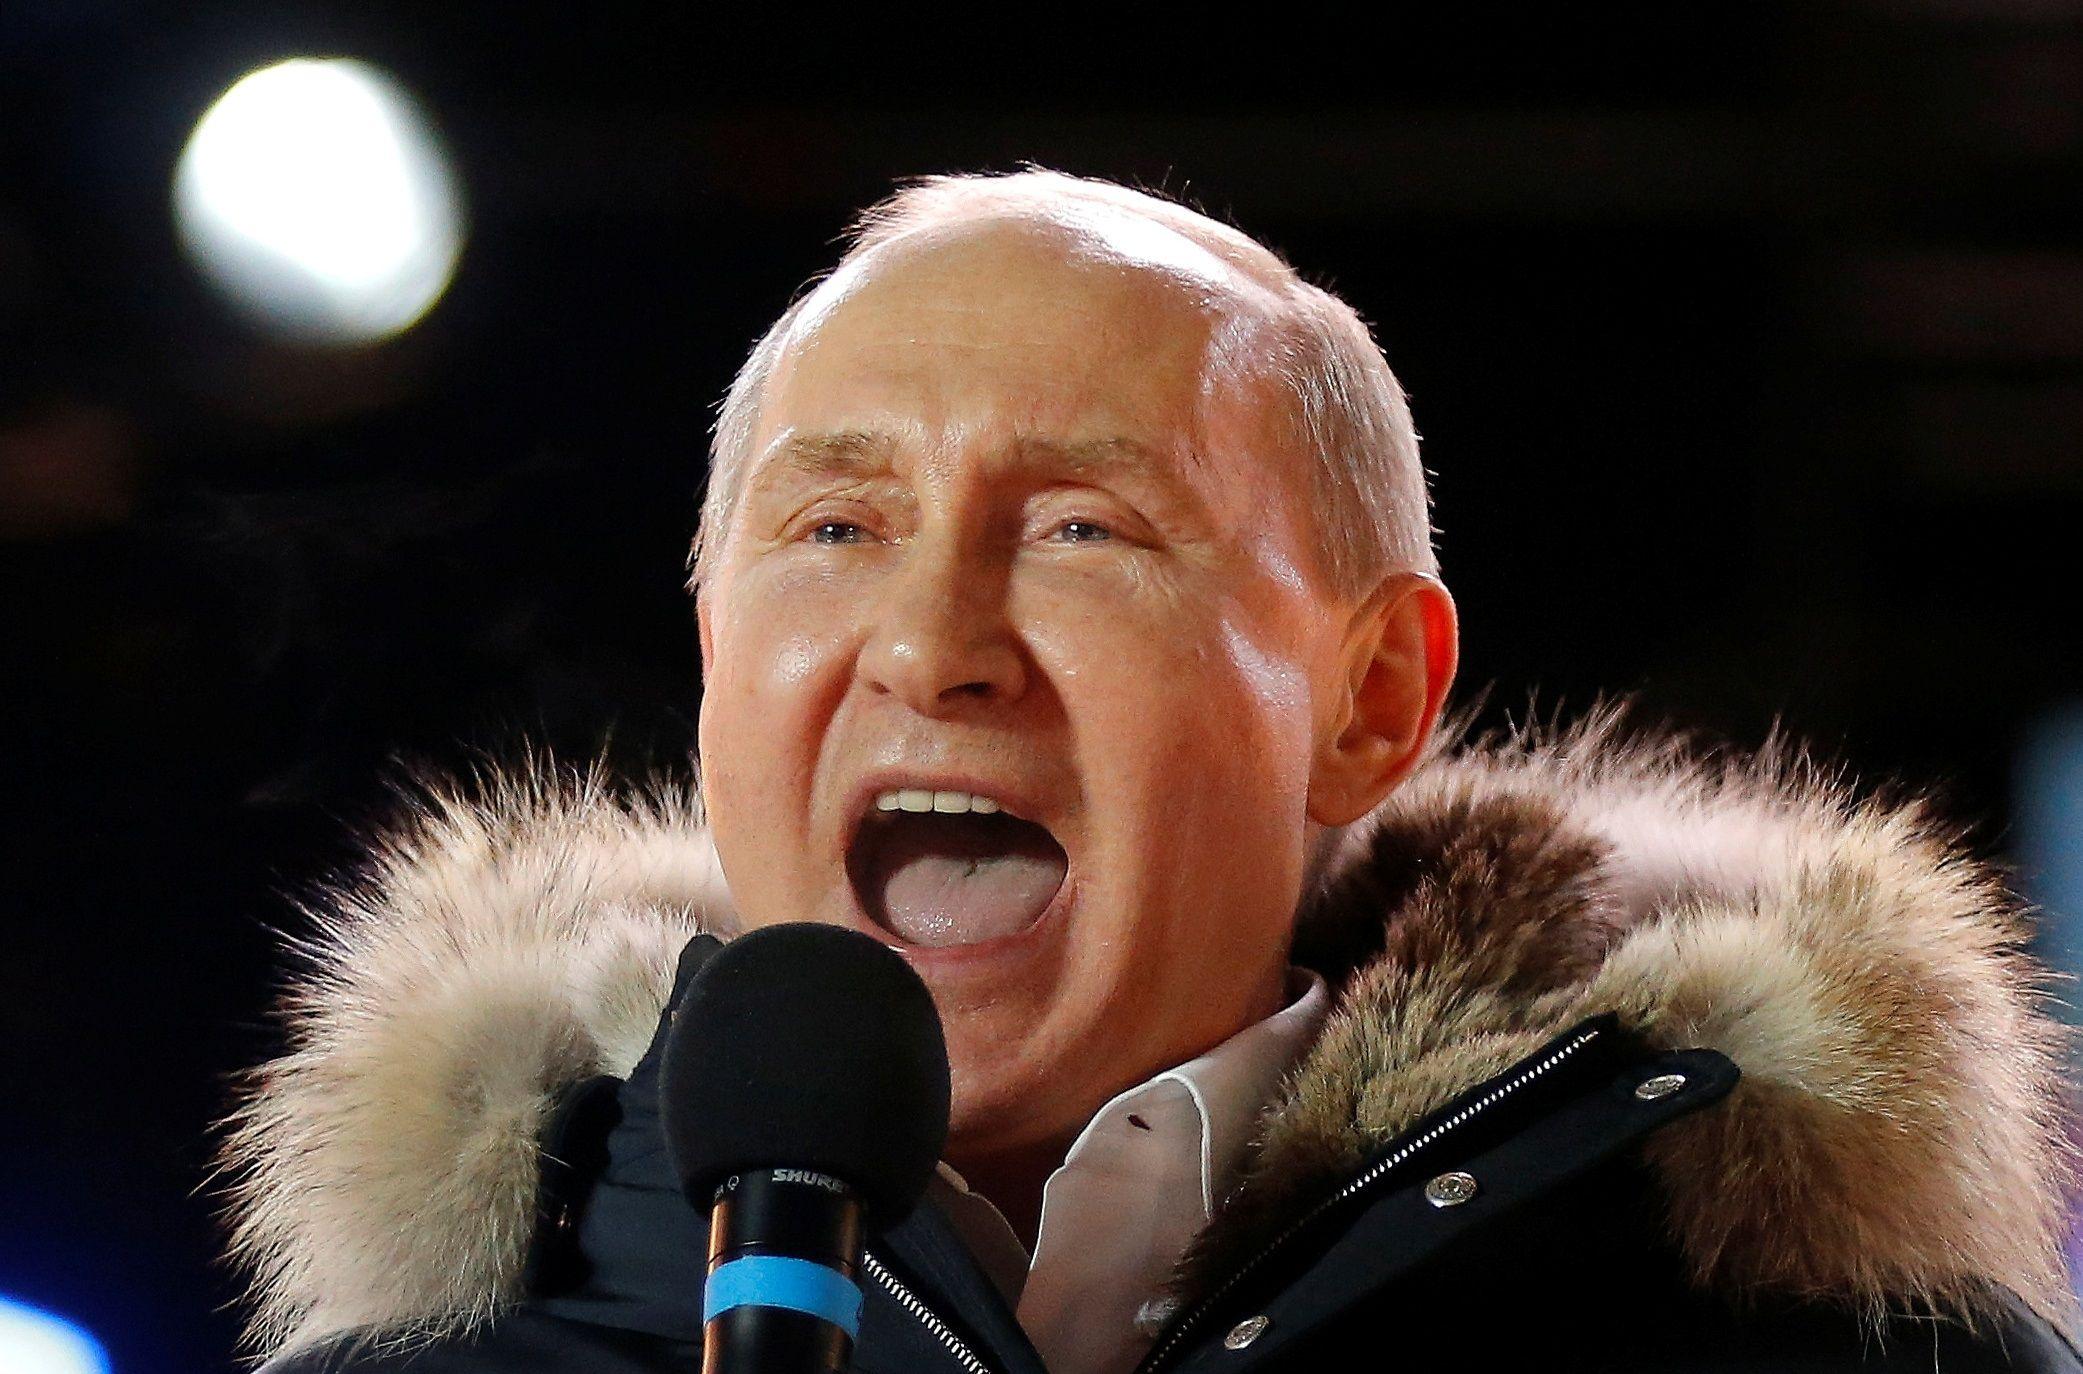 Vladimir Putin Russia election